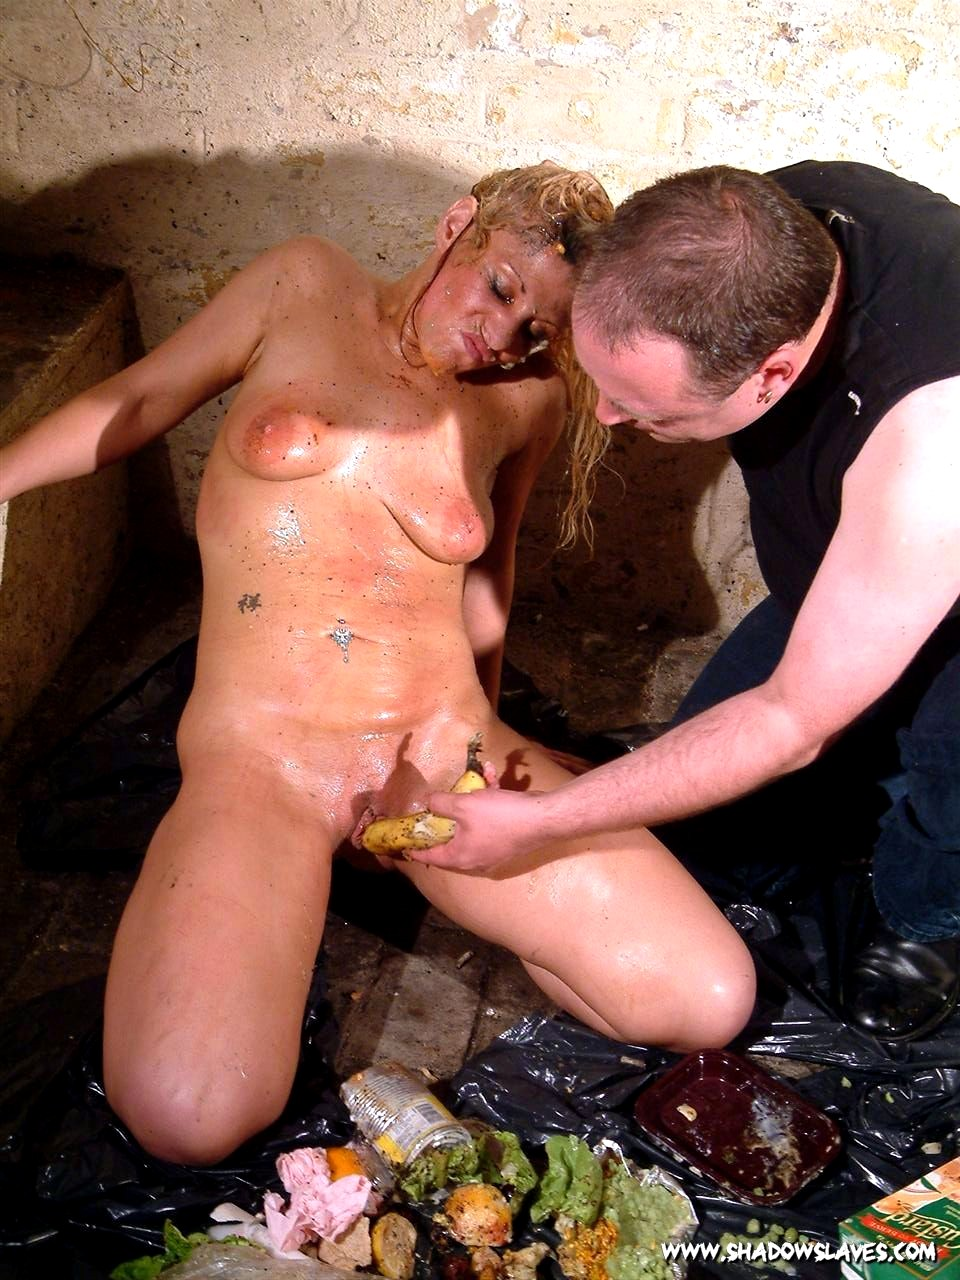 Disgusting Most Viewed Porn Galery Pics